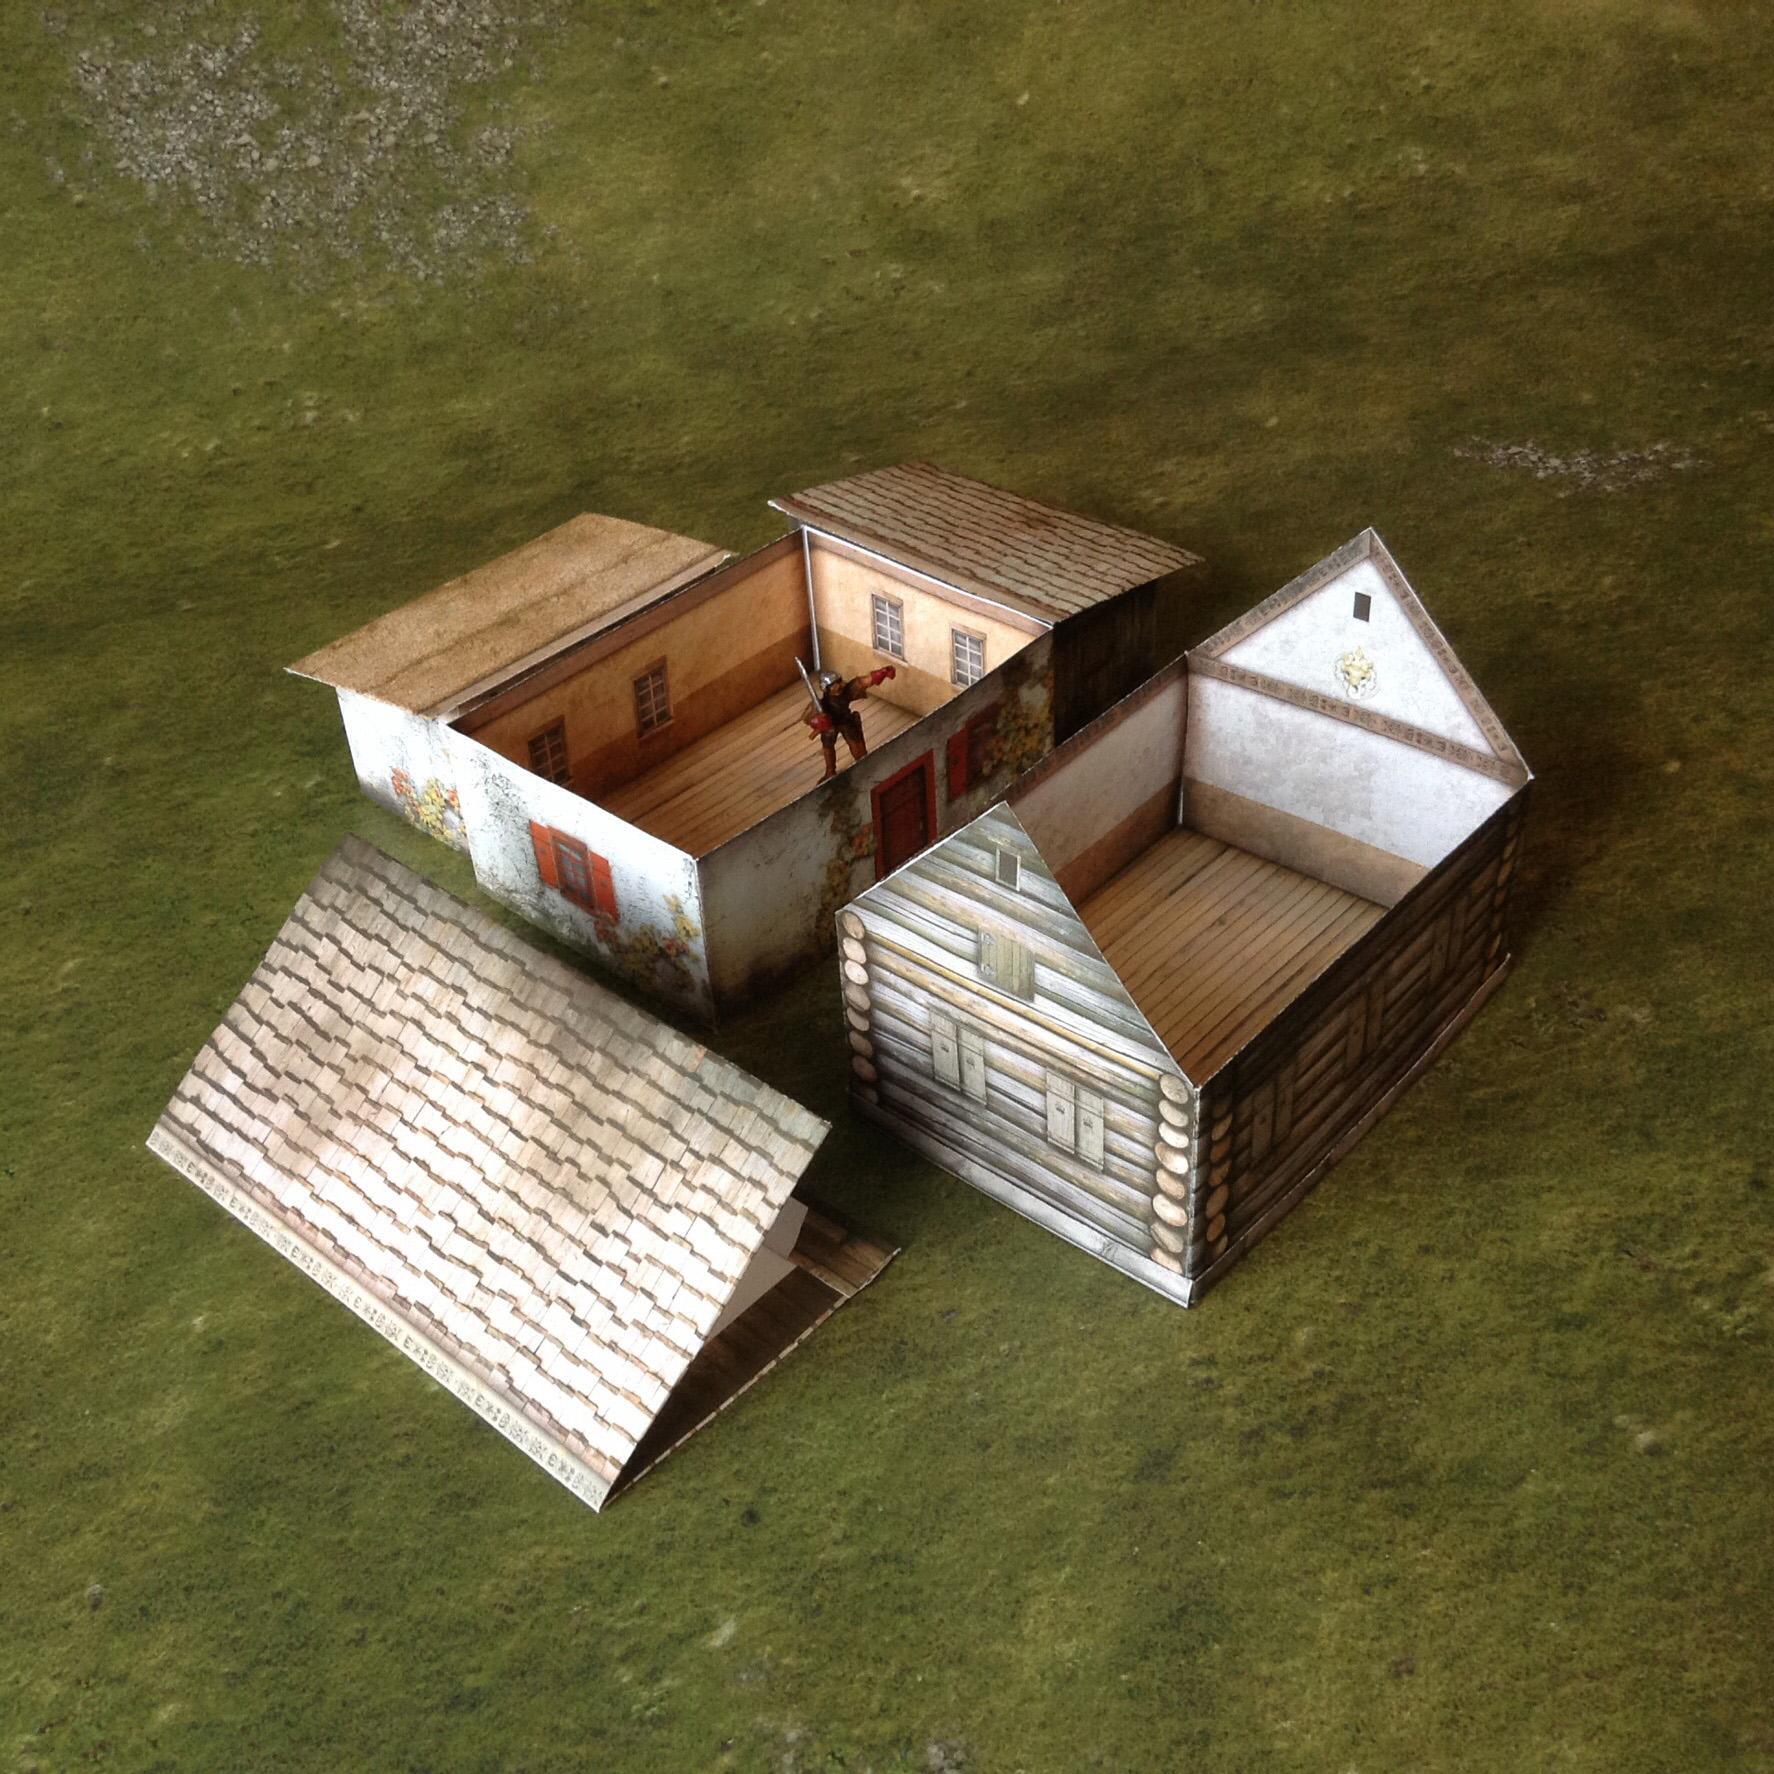 Foldable Kislevite house